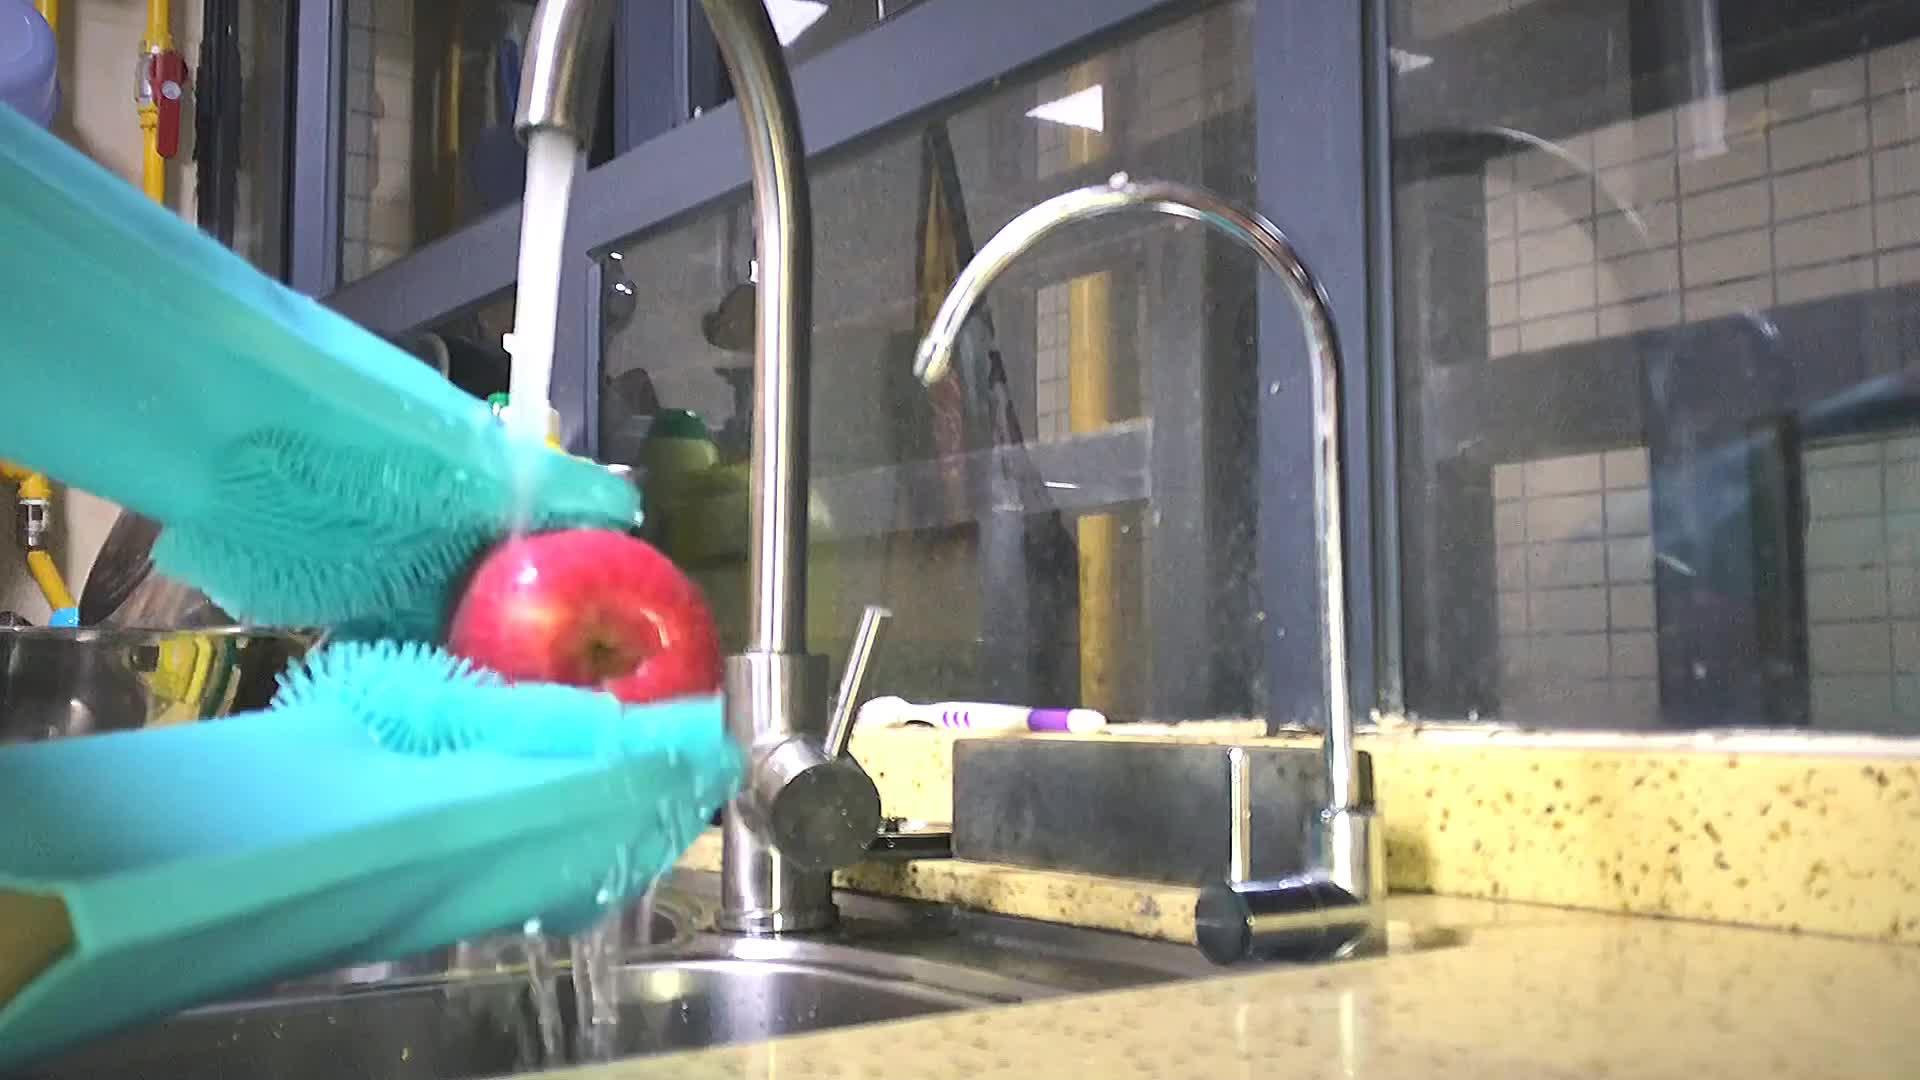 Eco Magia luvas de lavar luvas de silicone Resistente Ao Calor de silicone, luvas de limpeza, luvas de lavar louça silicone